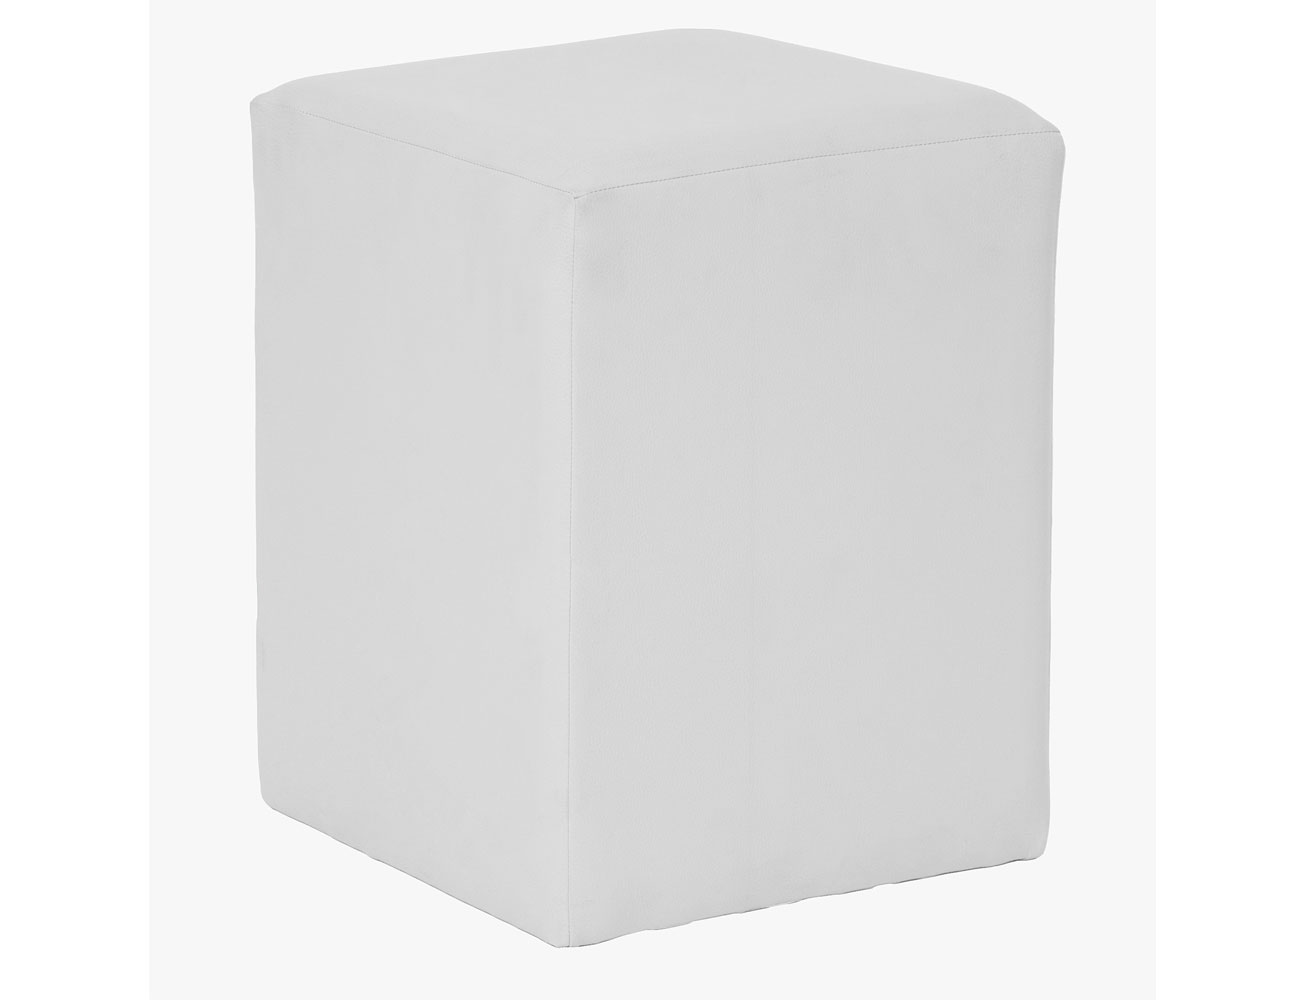 Taburete cubo blanco